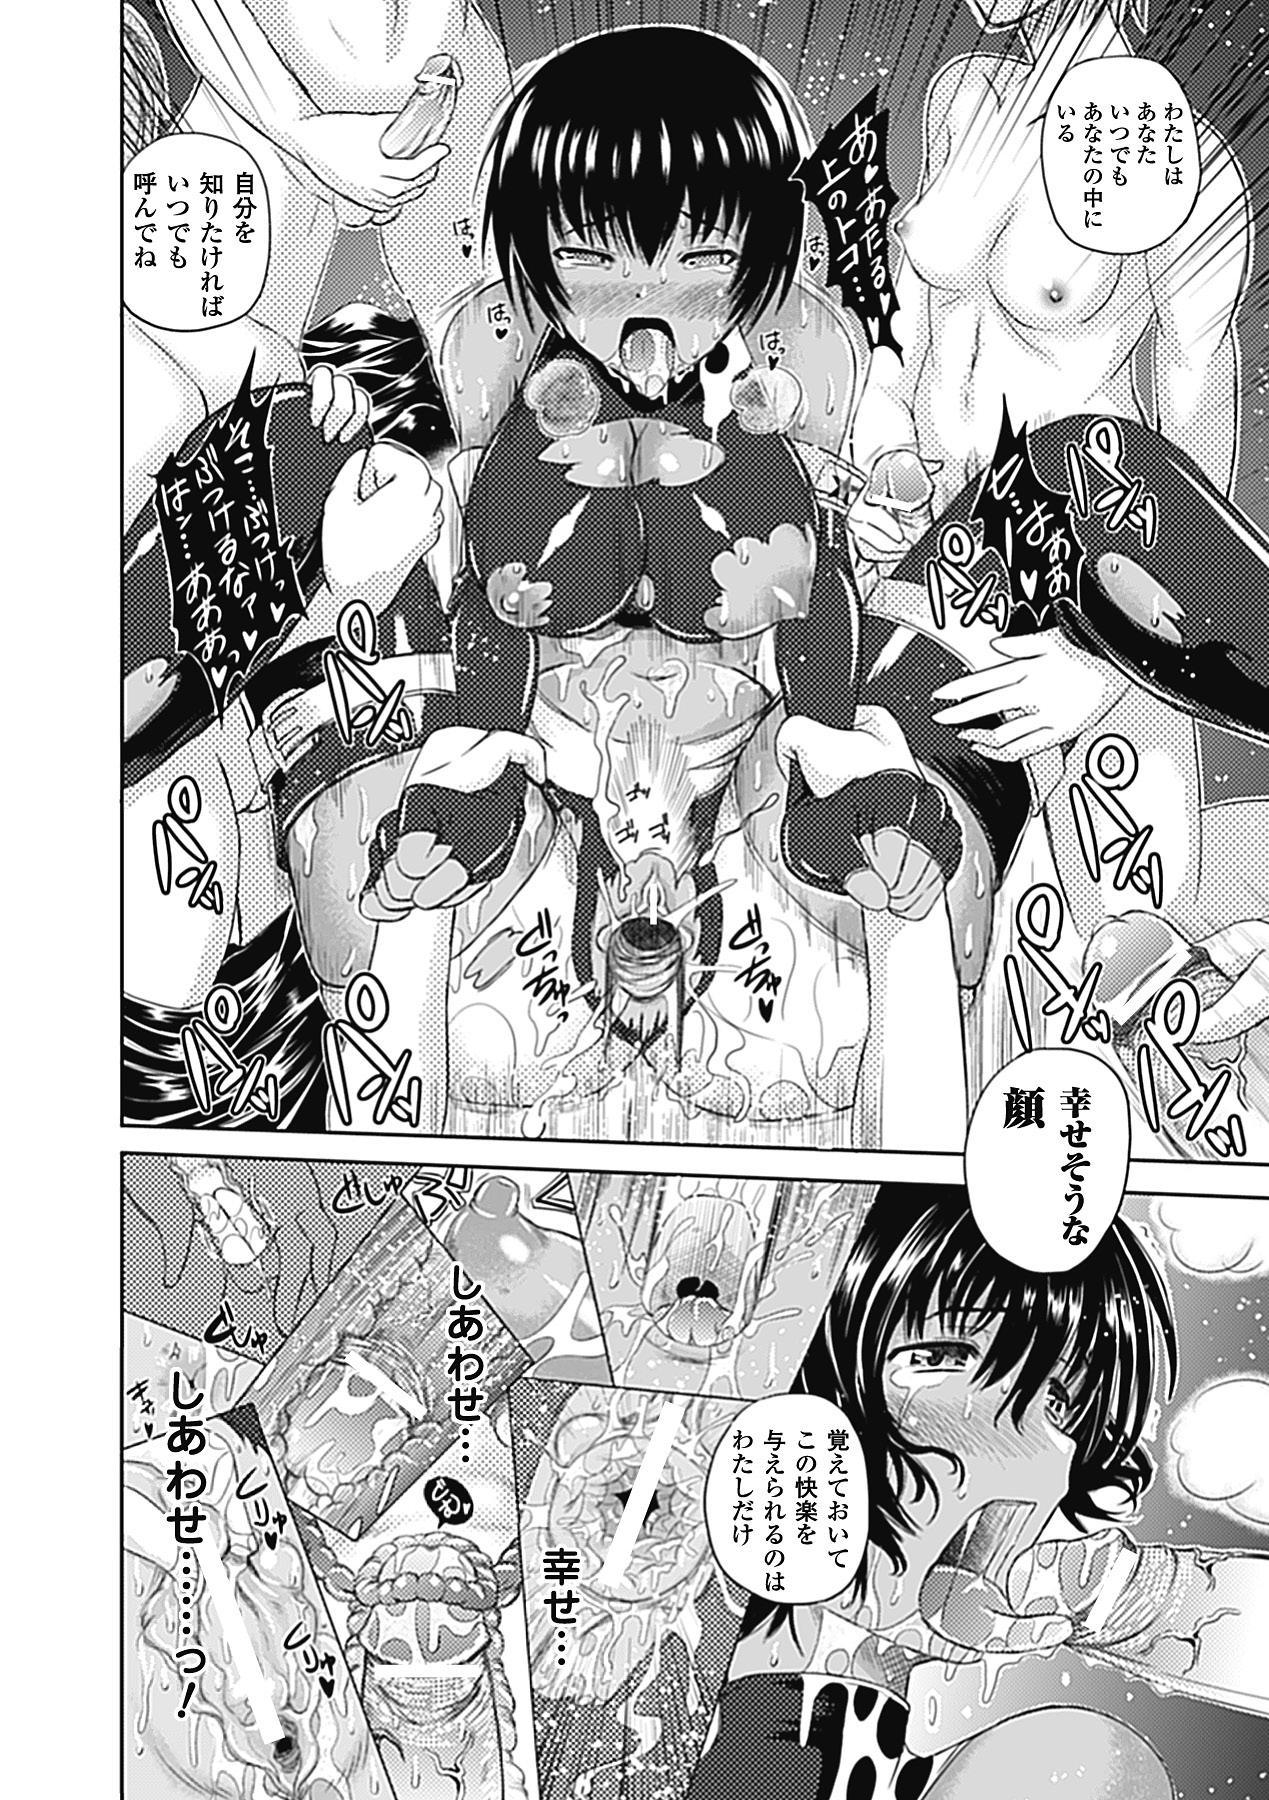 Megami Crisis 5 155